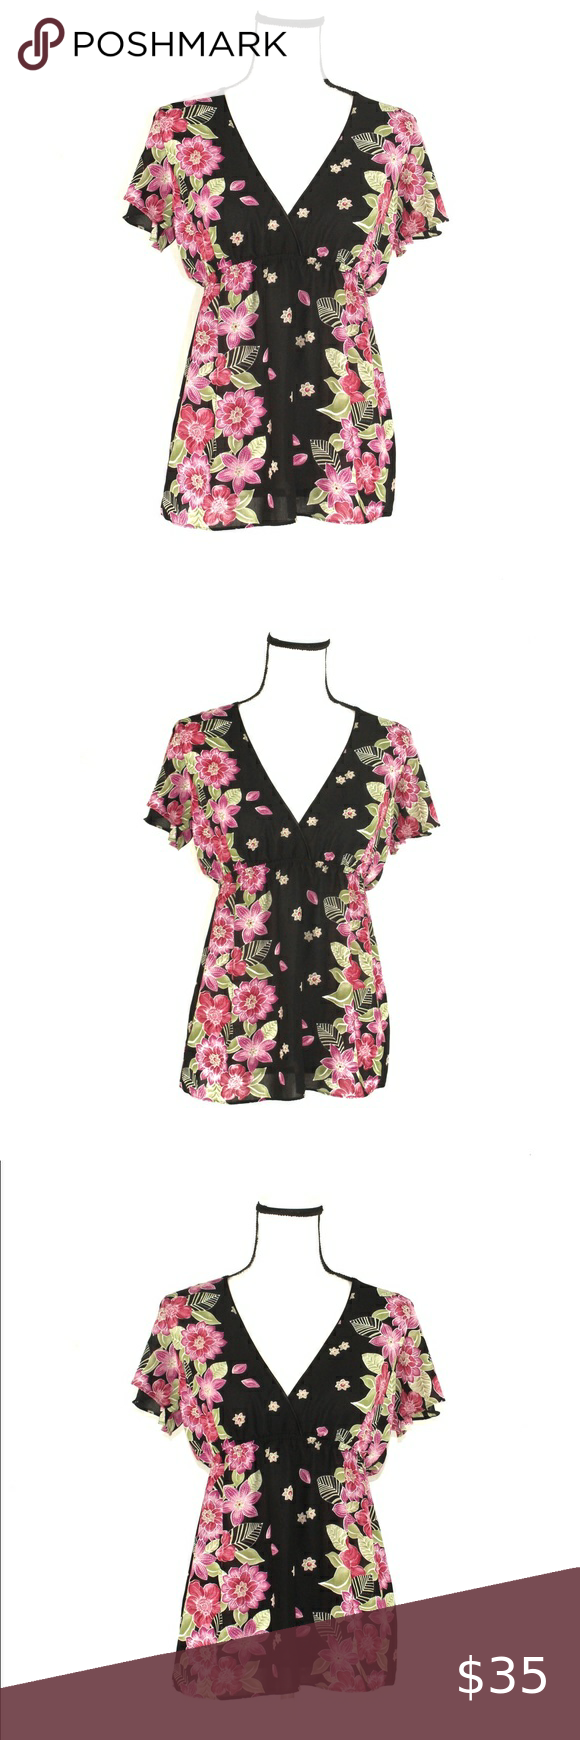 Oscar De La Renta Floral Blouse In Excellent Condition Size Small 100 Polyester Smoke Free Facility M Clothes Design Silk Floral Blouse Blouse Vintage